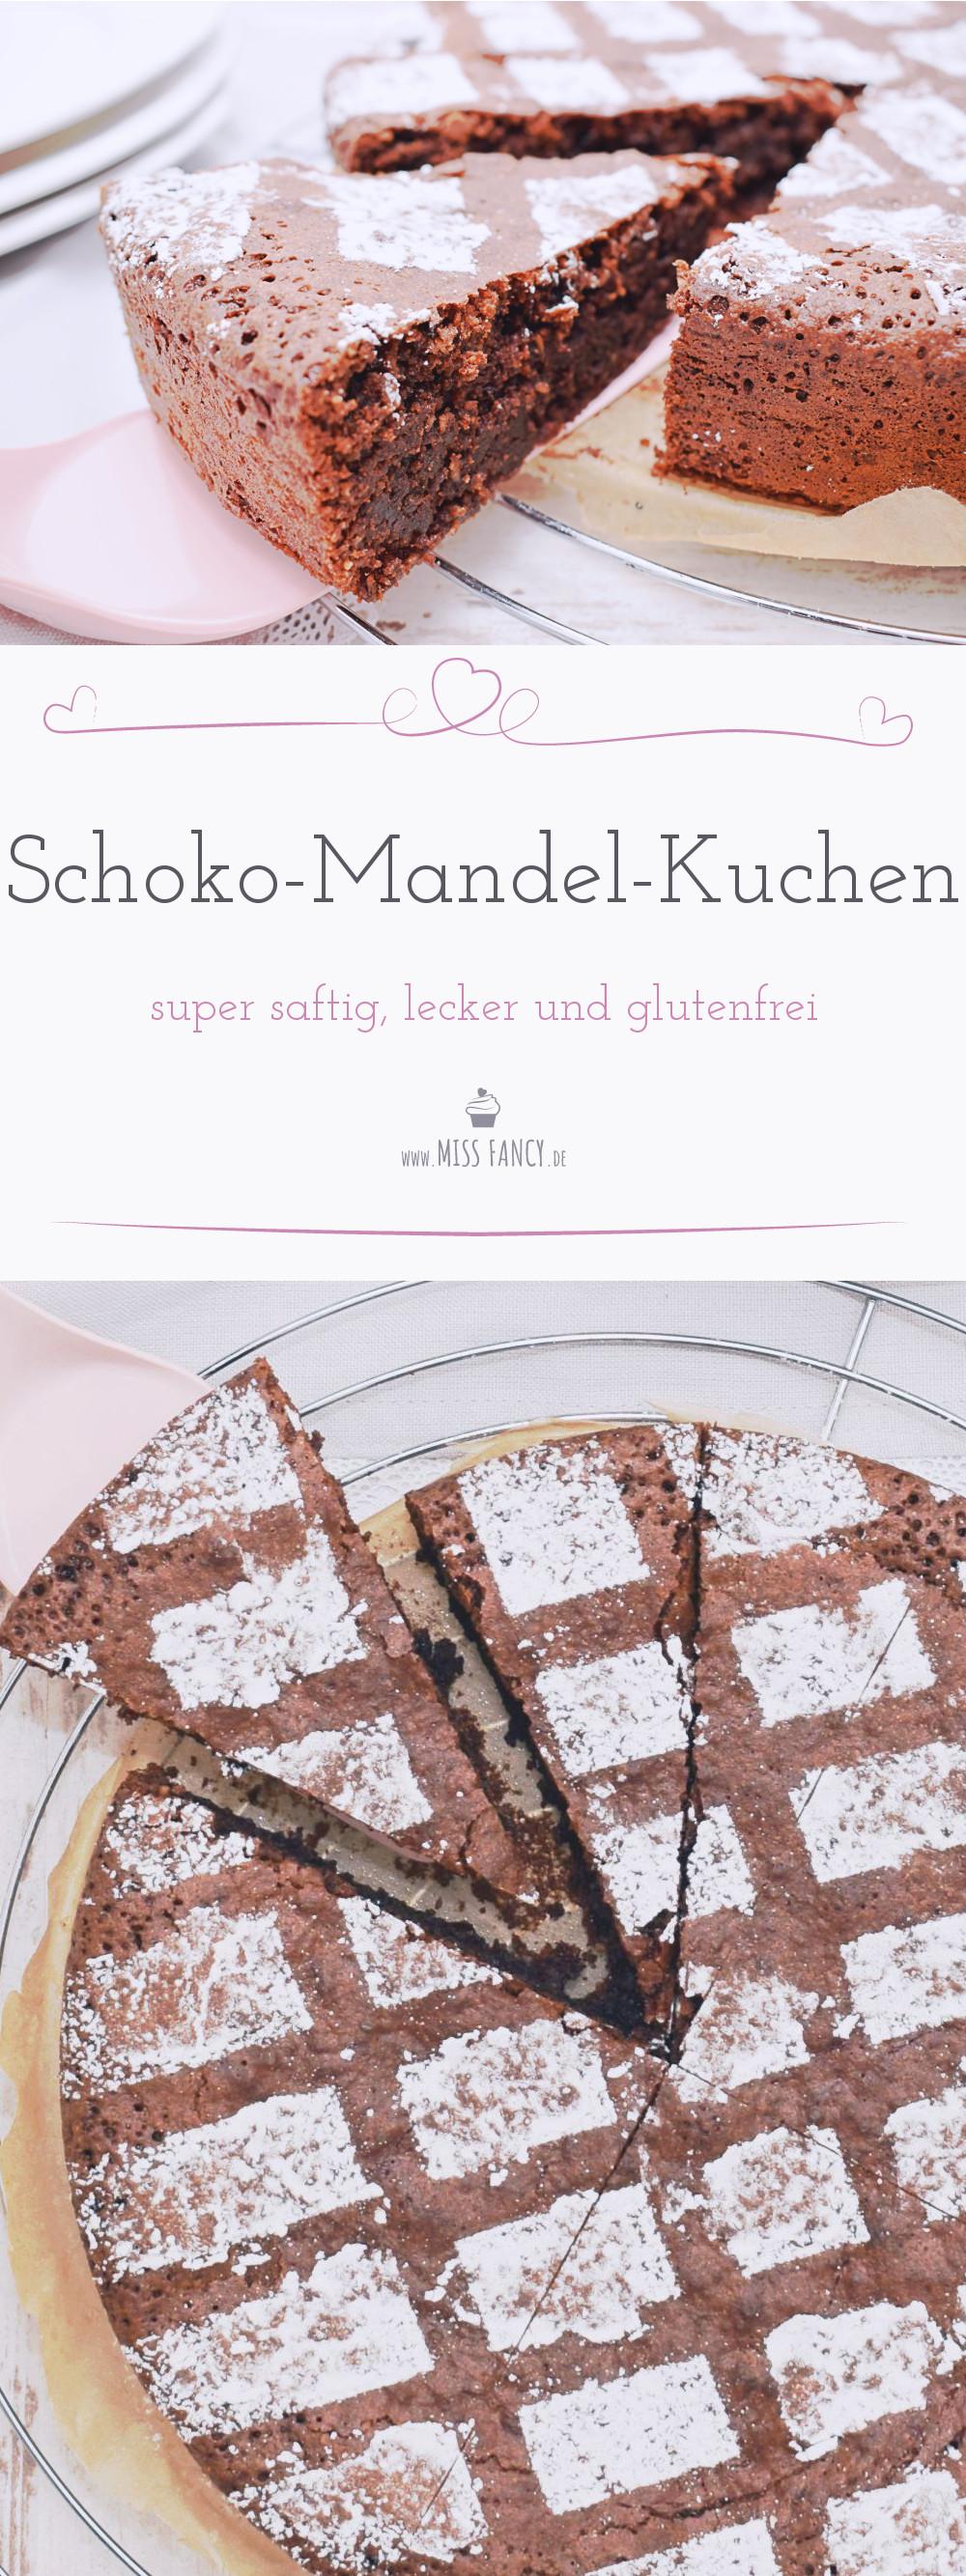 Rezept-Schokoladenkuchen-missfancy-foodblog